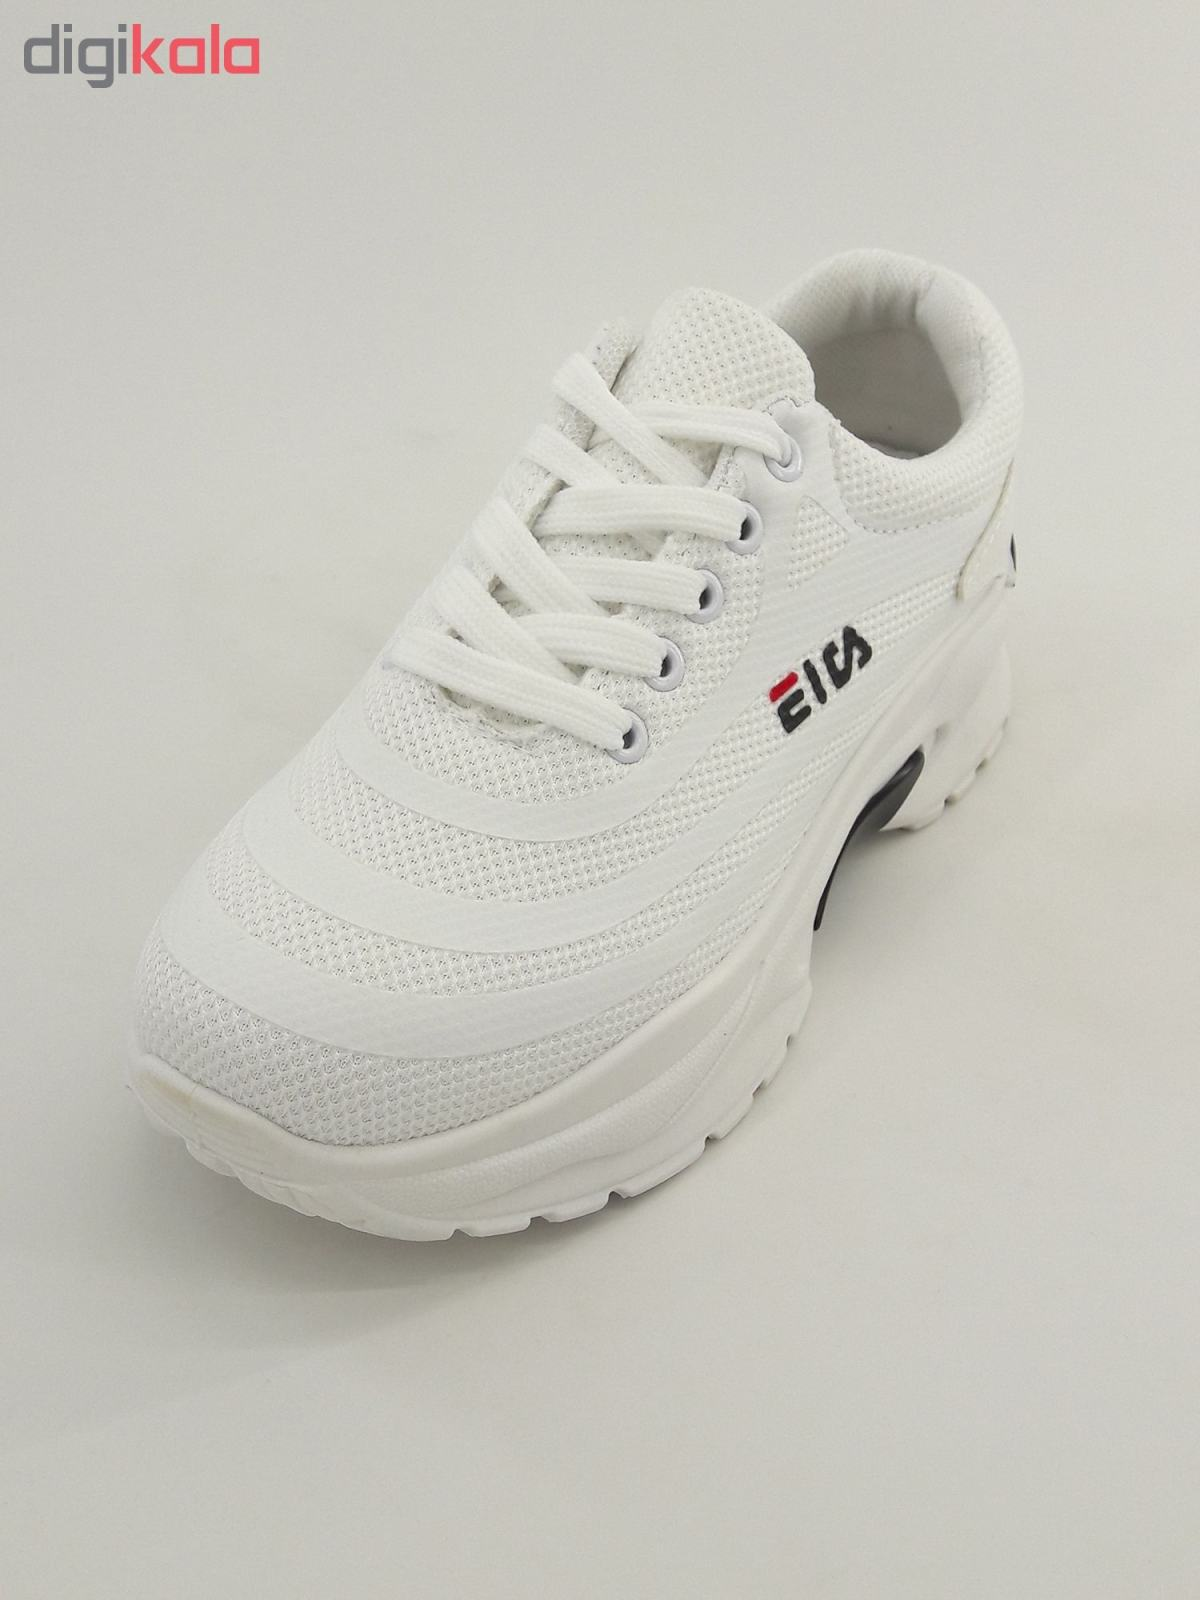 کفش راحتی نه ایلا مدل Sport wh01